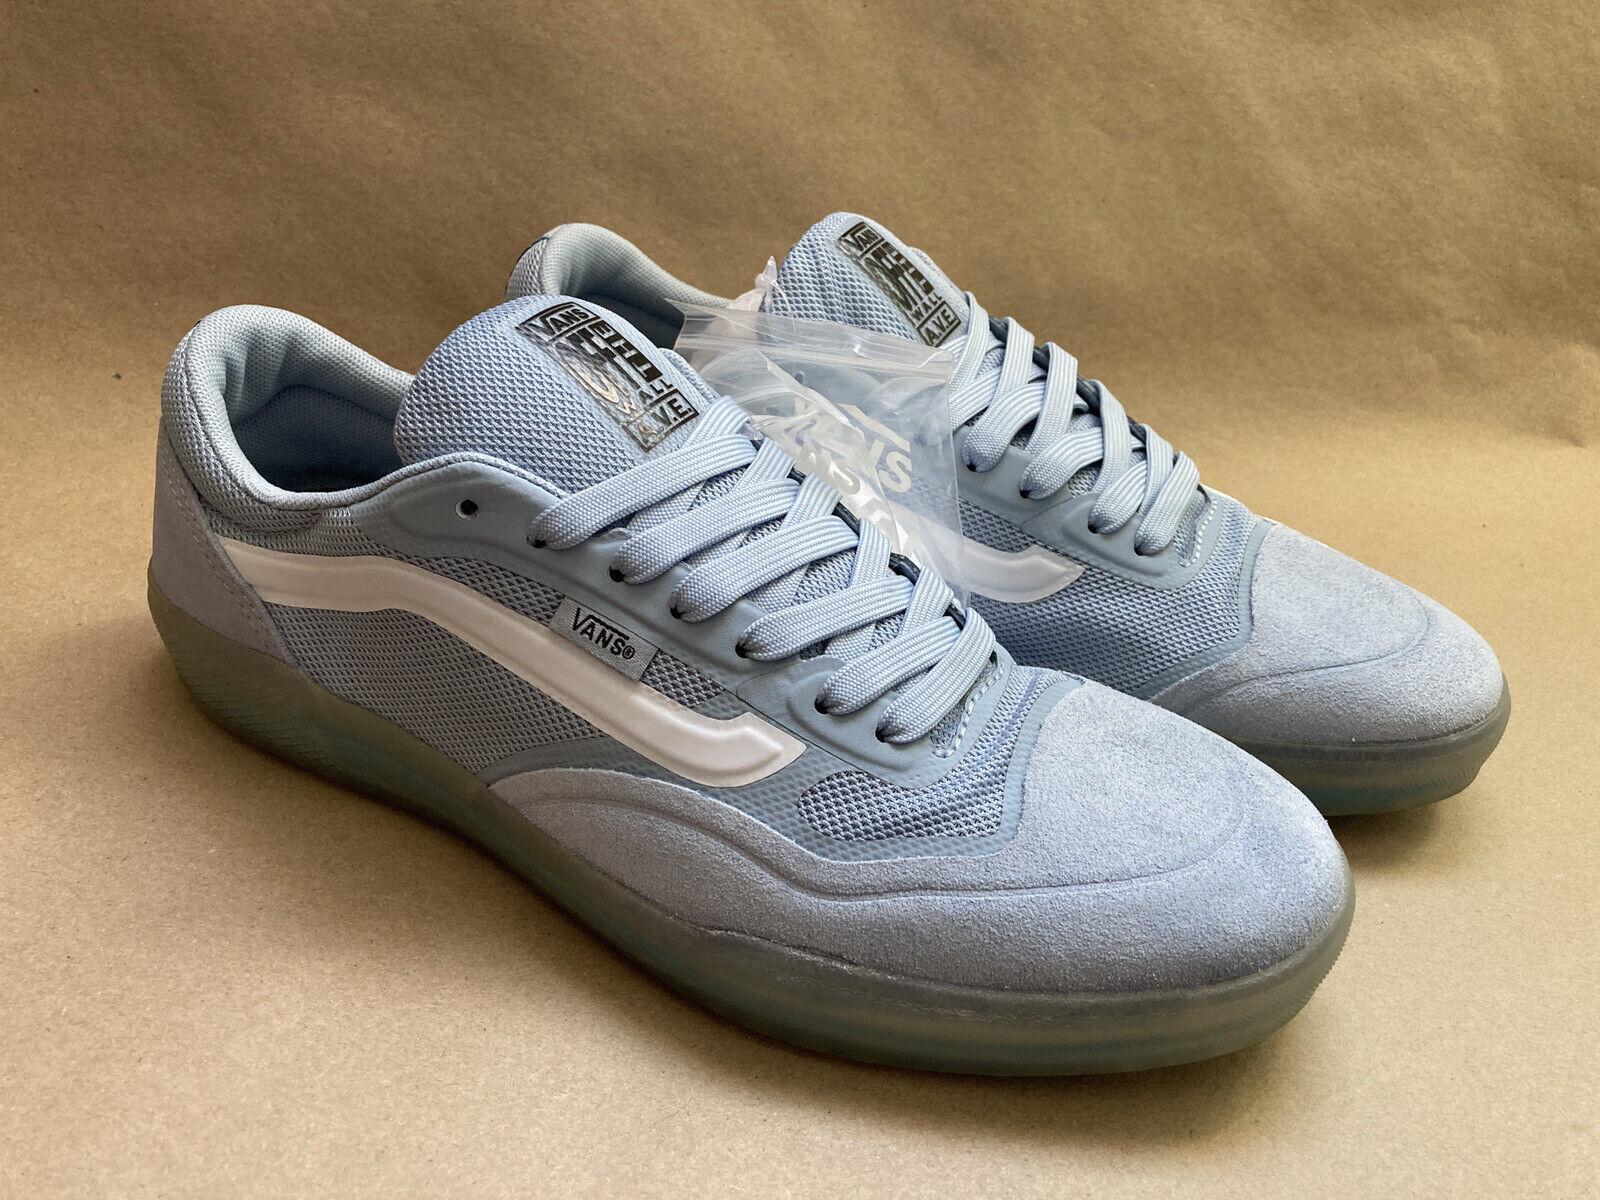 VANS Men's Epoch Pro Skate Shoes 10.5